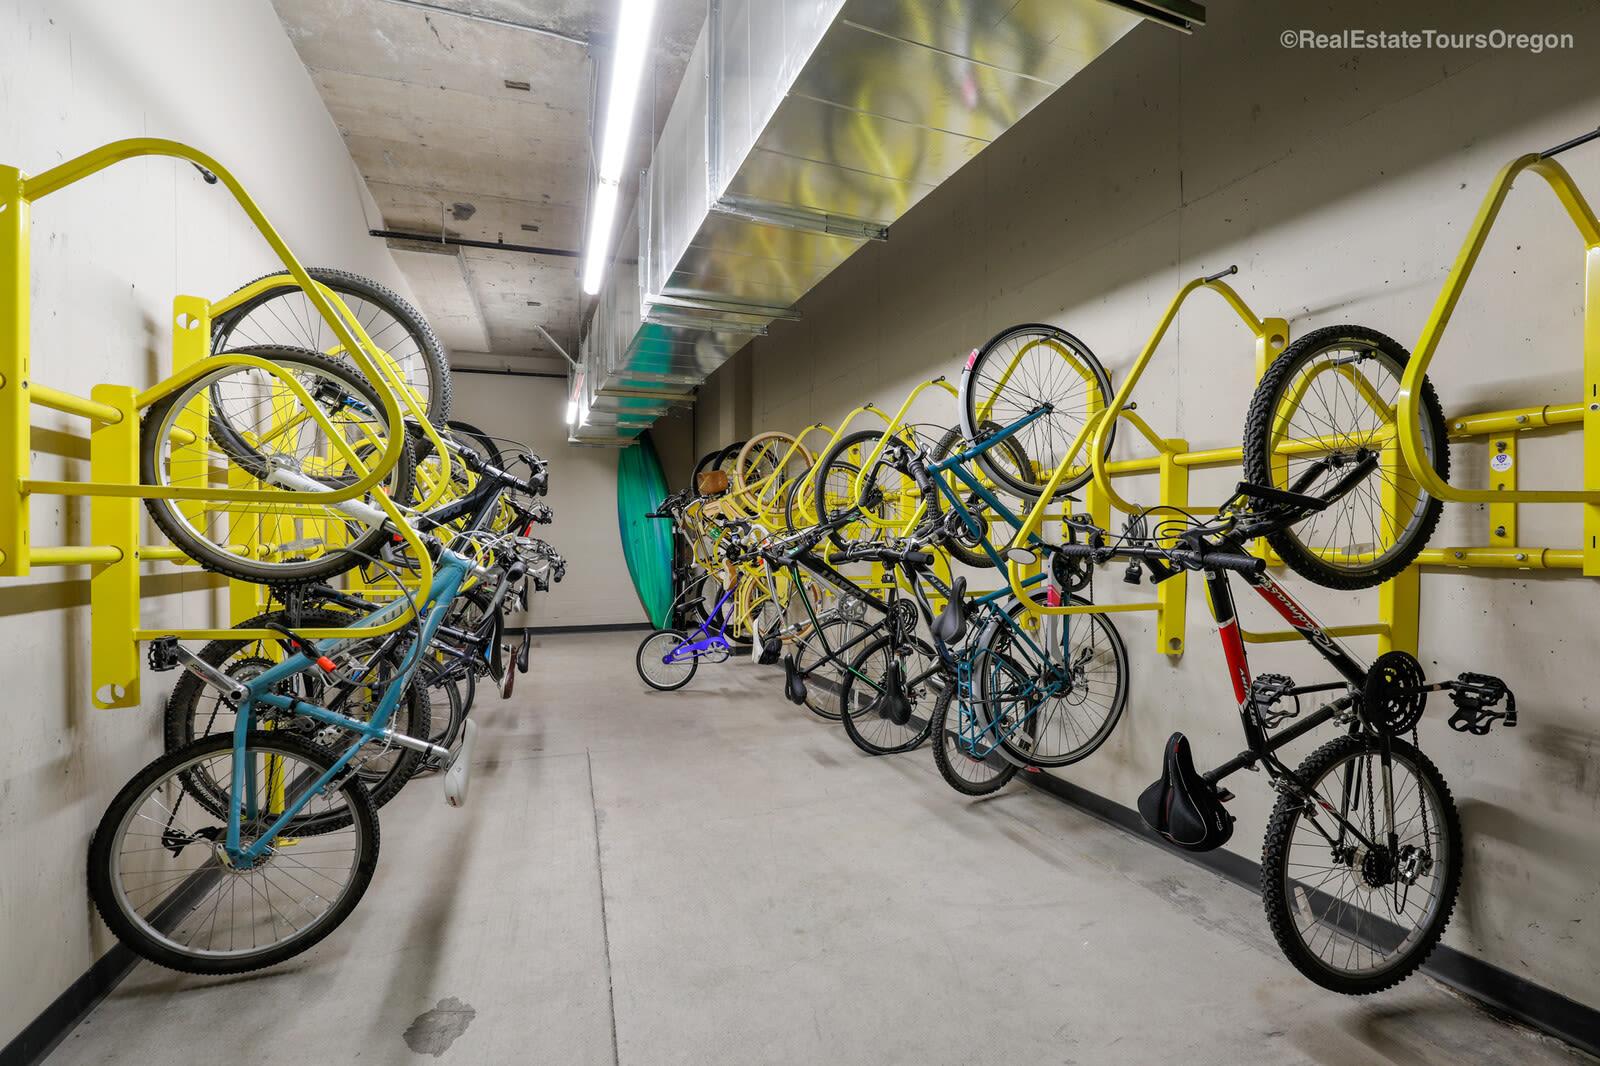 Bike storage at South Block Apartments in Salem, OR